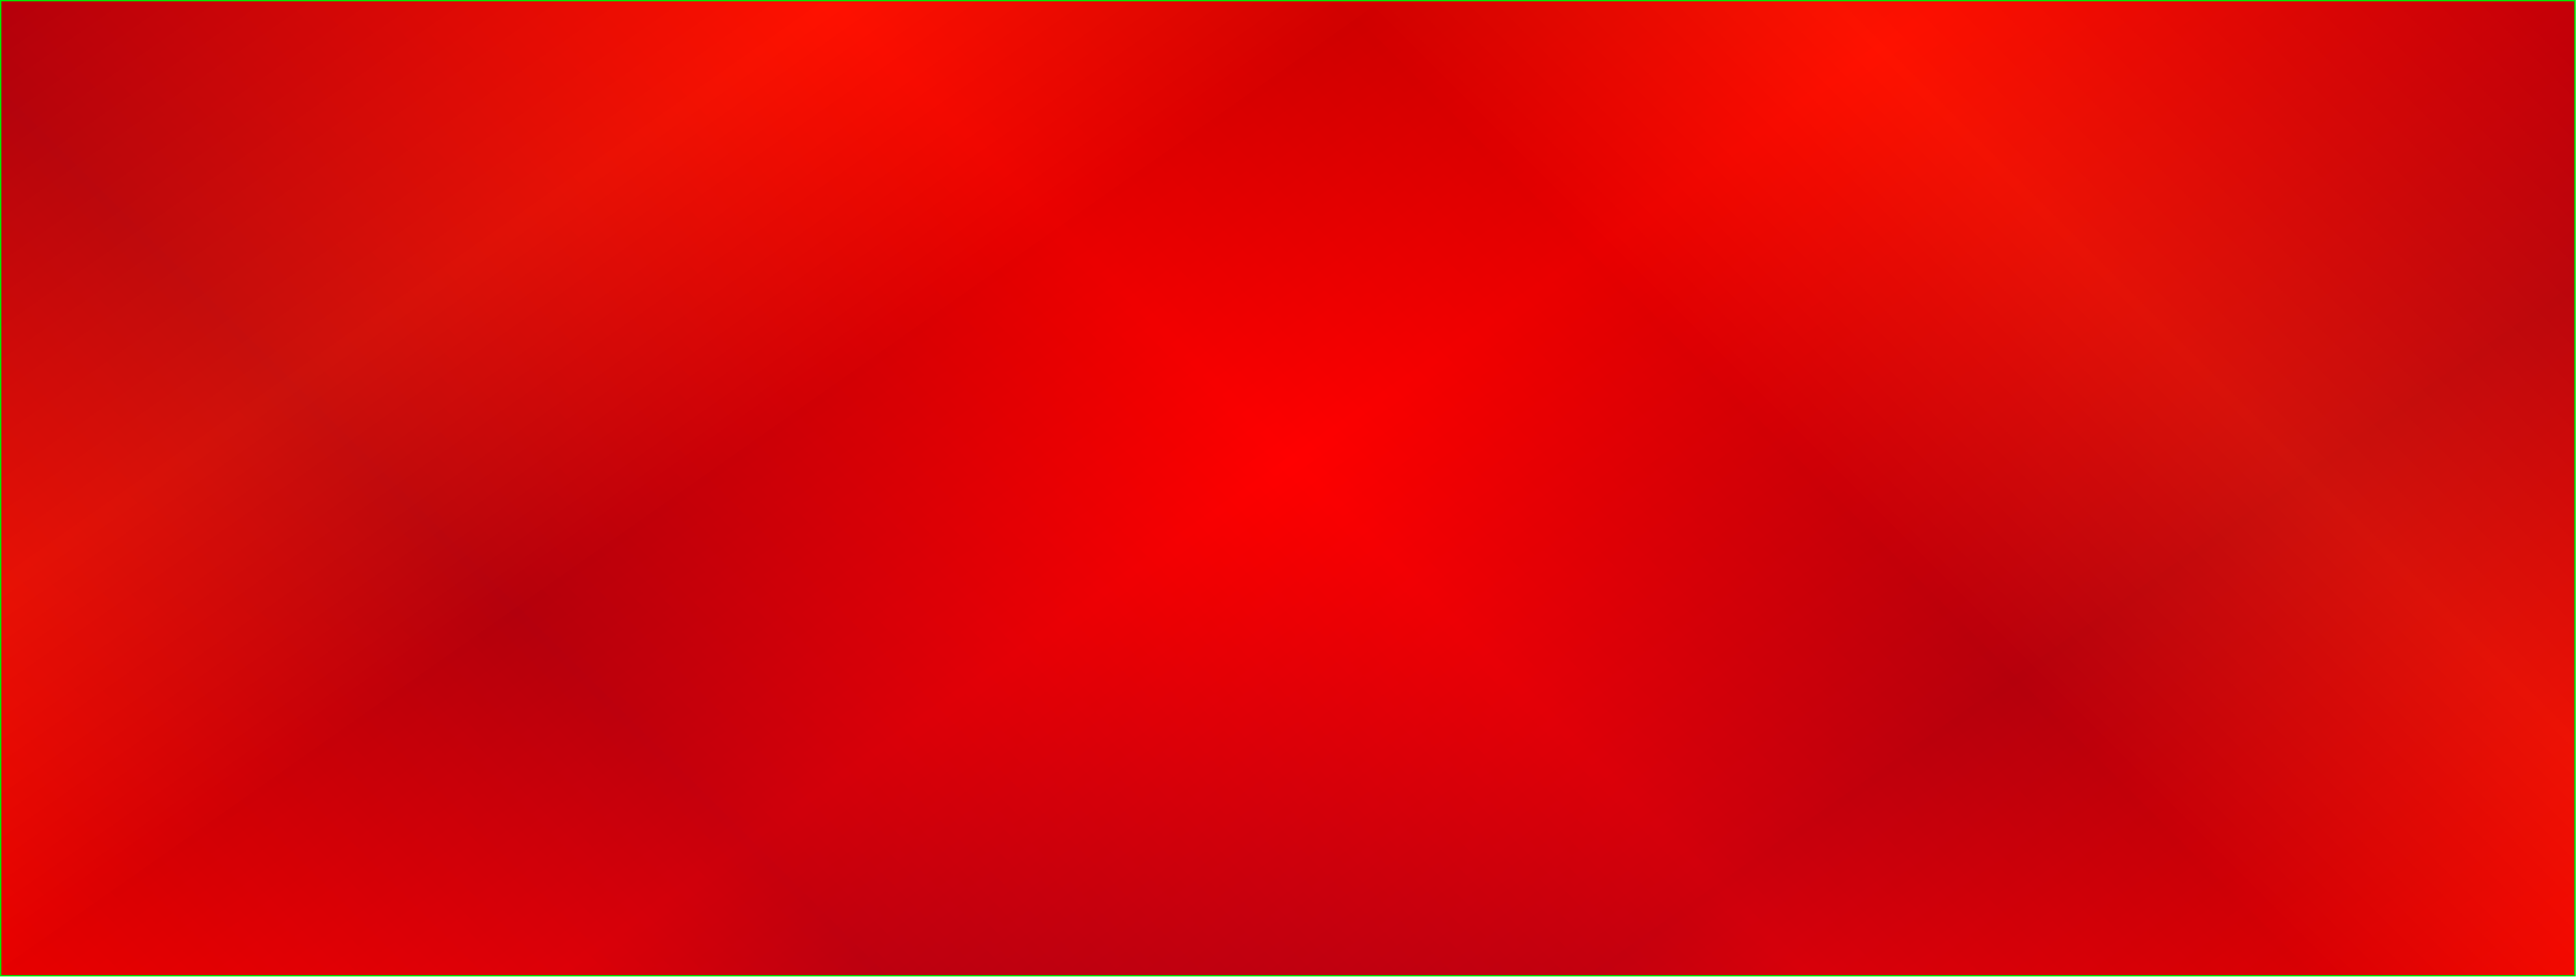 Red-Criss-Cross